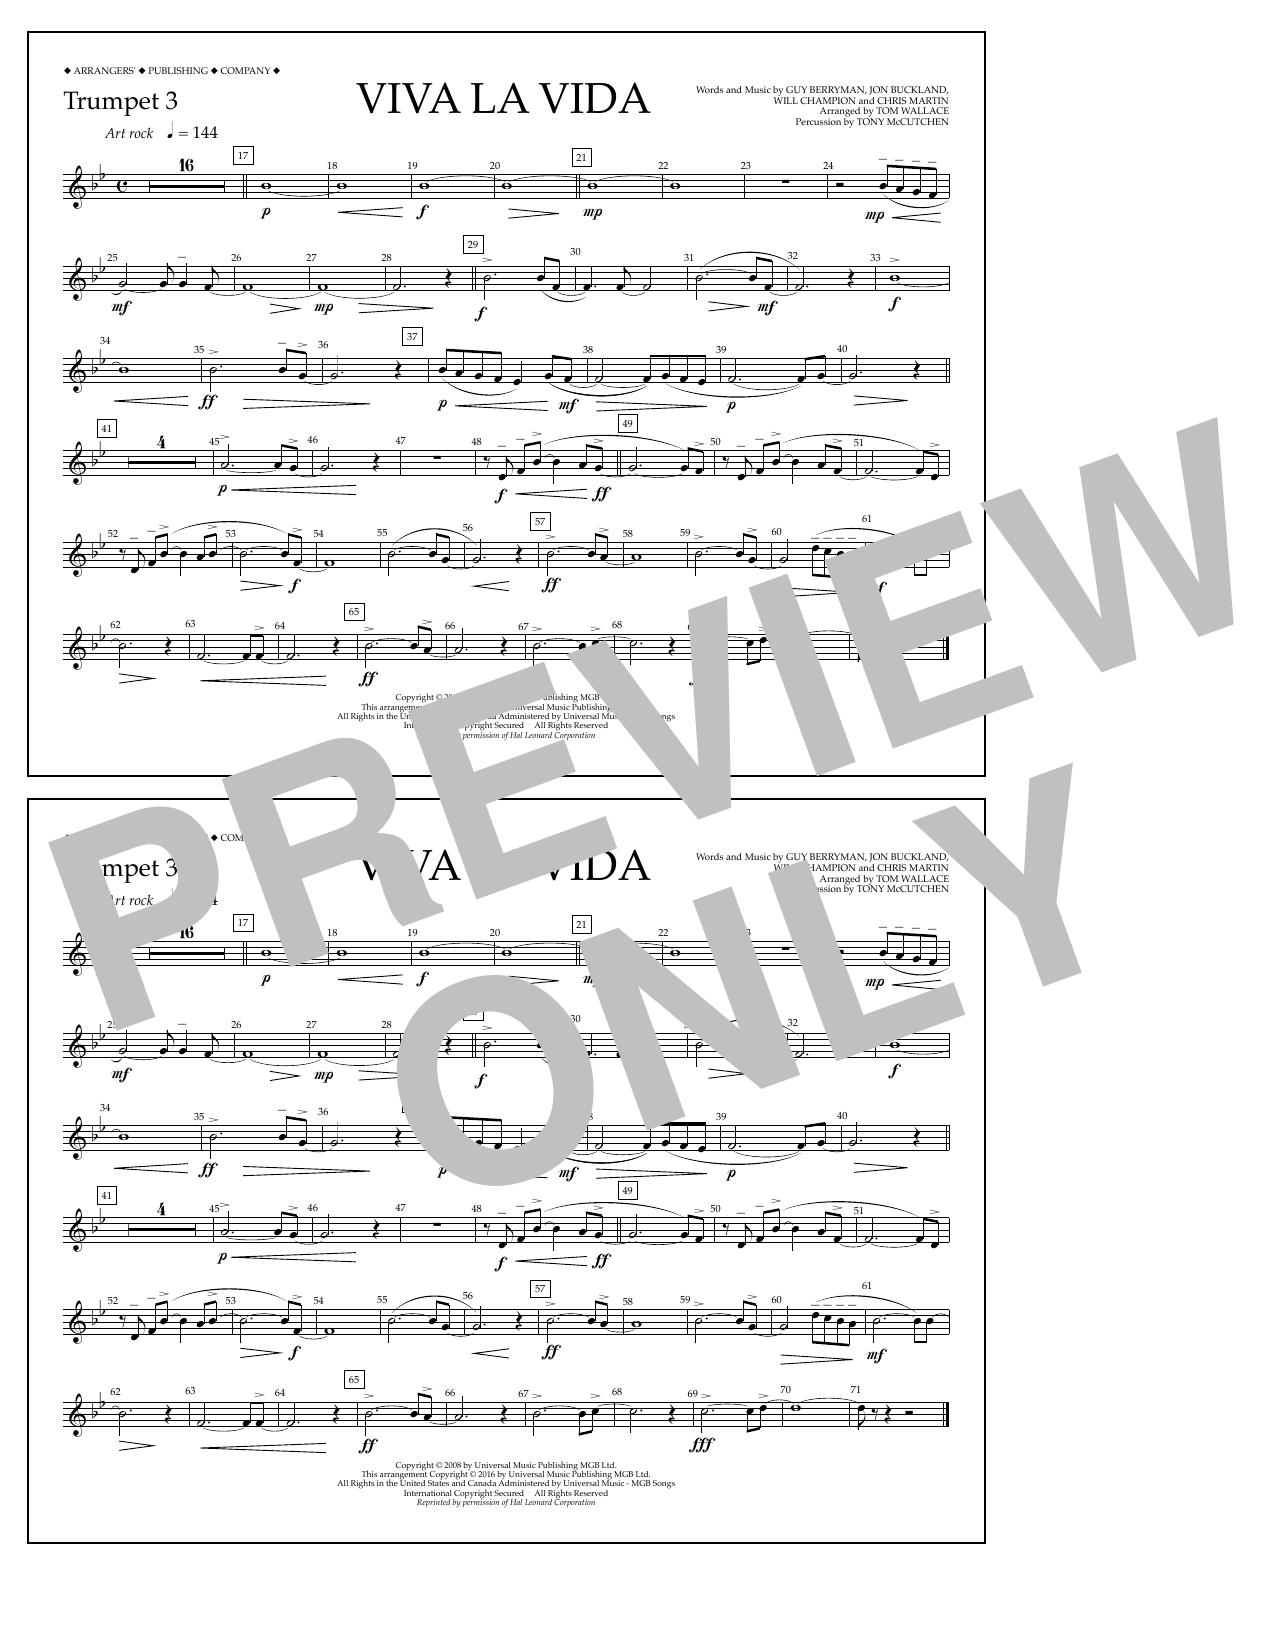 Coldplay - Viva La Vida - Trumpet 3